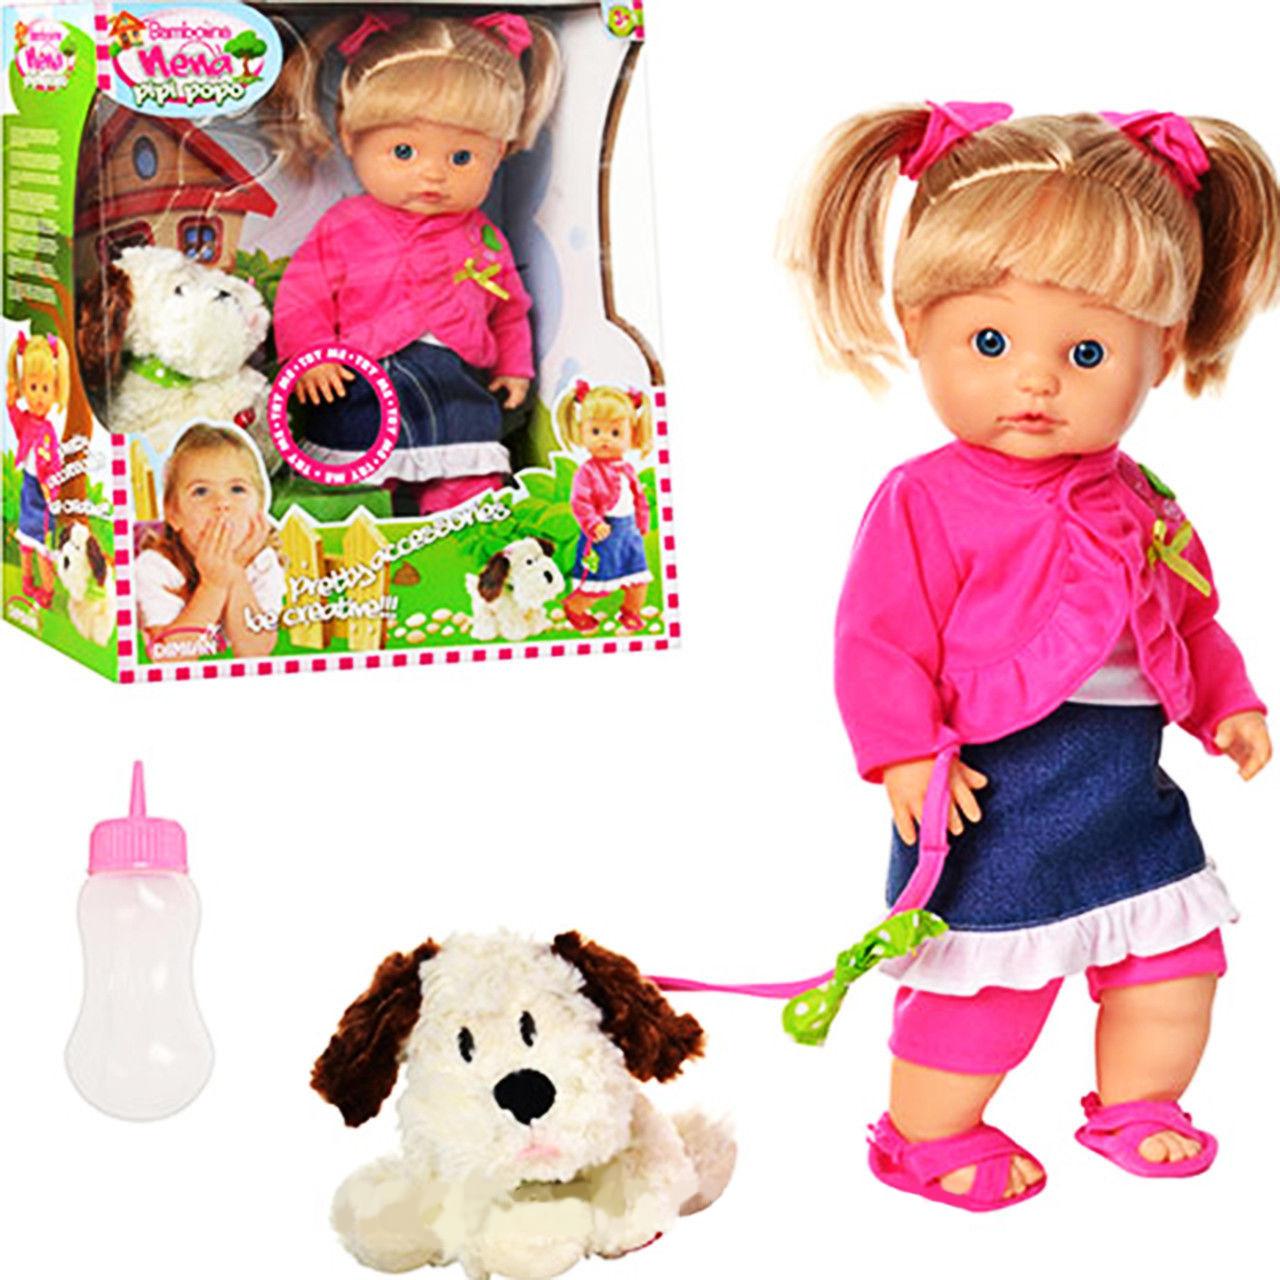 Кукла Bambolina с собачкой - Nena, 42 см, пьет, писаетПупсы<br>Кукла Bambolina с собачкой - Nena, 42 см, пьет, писает<br>